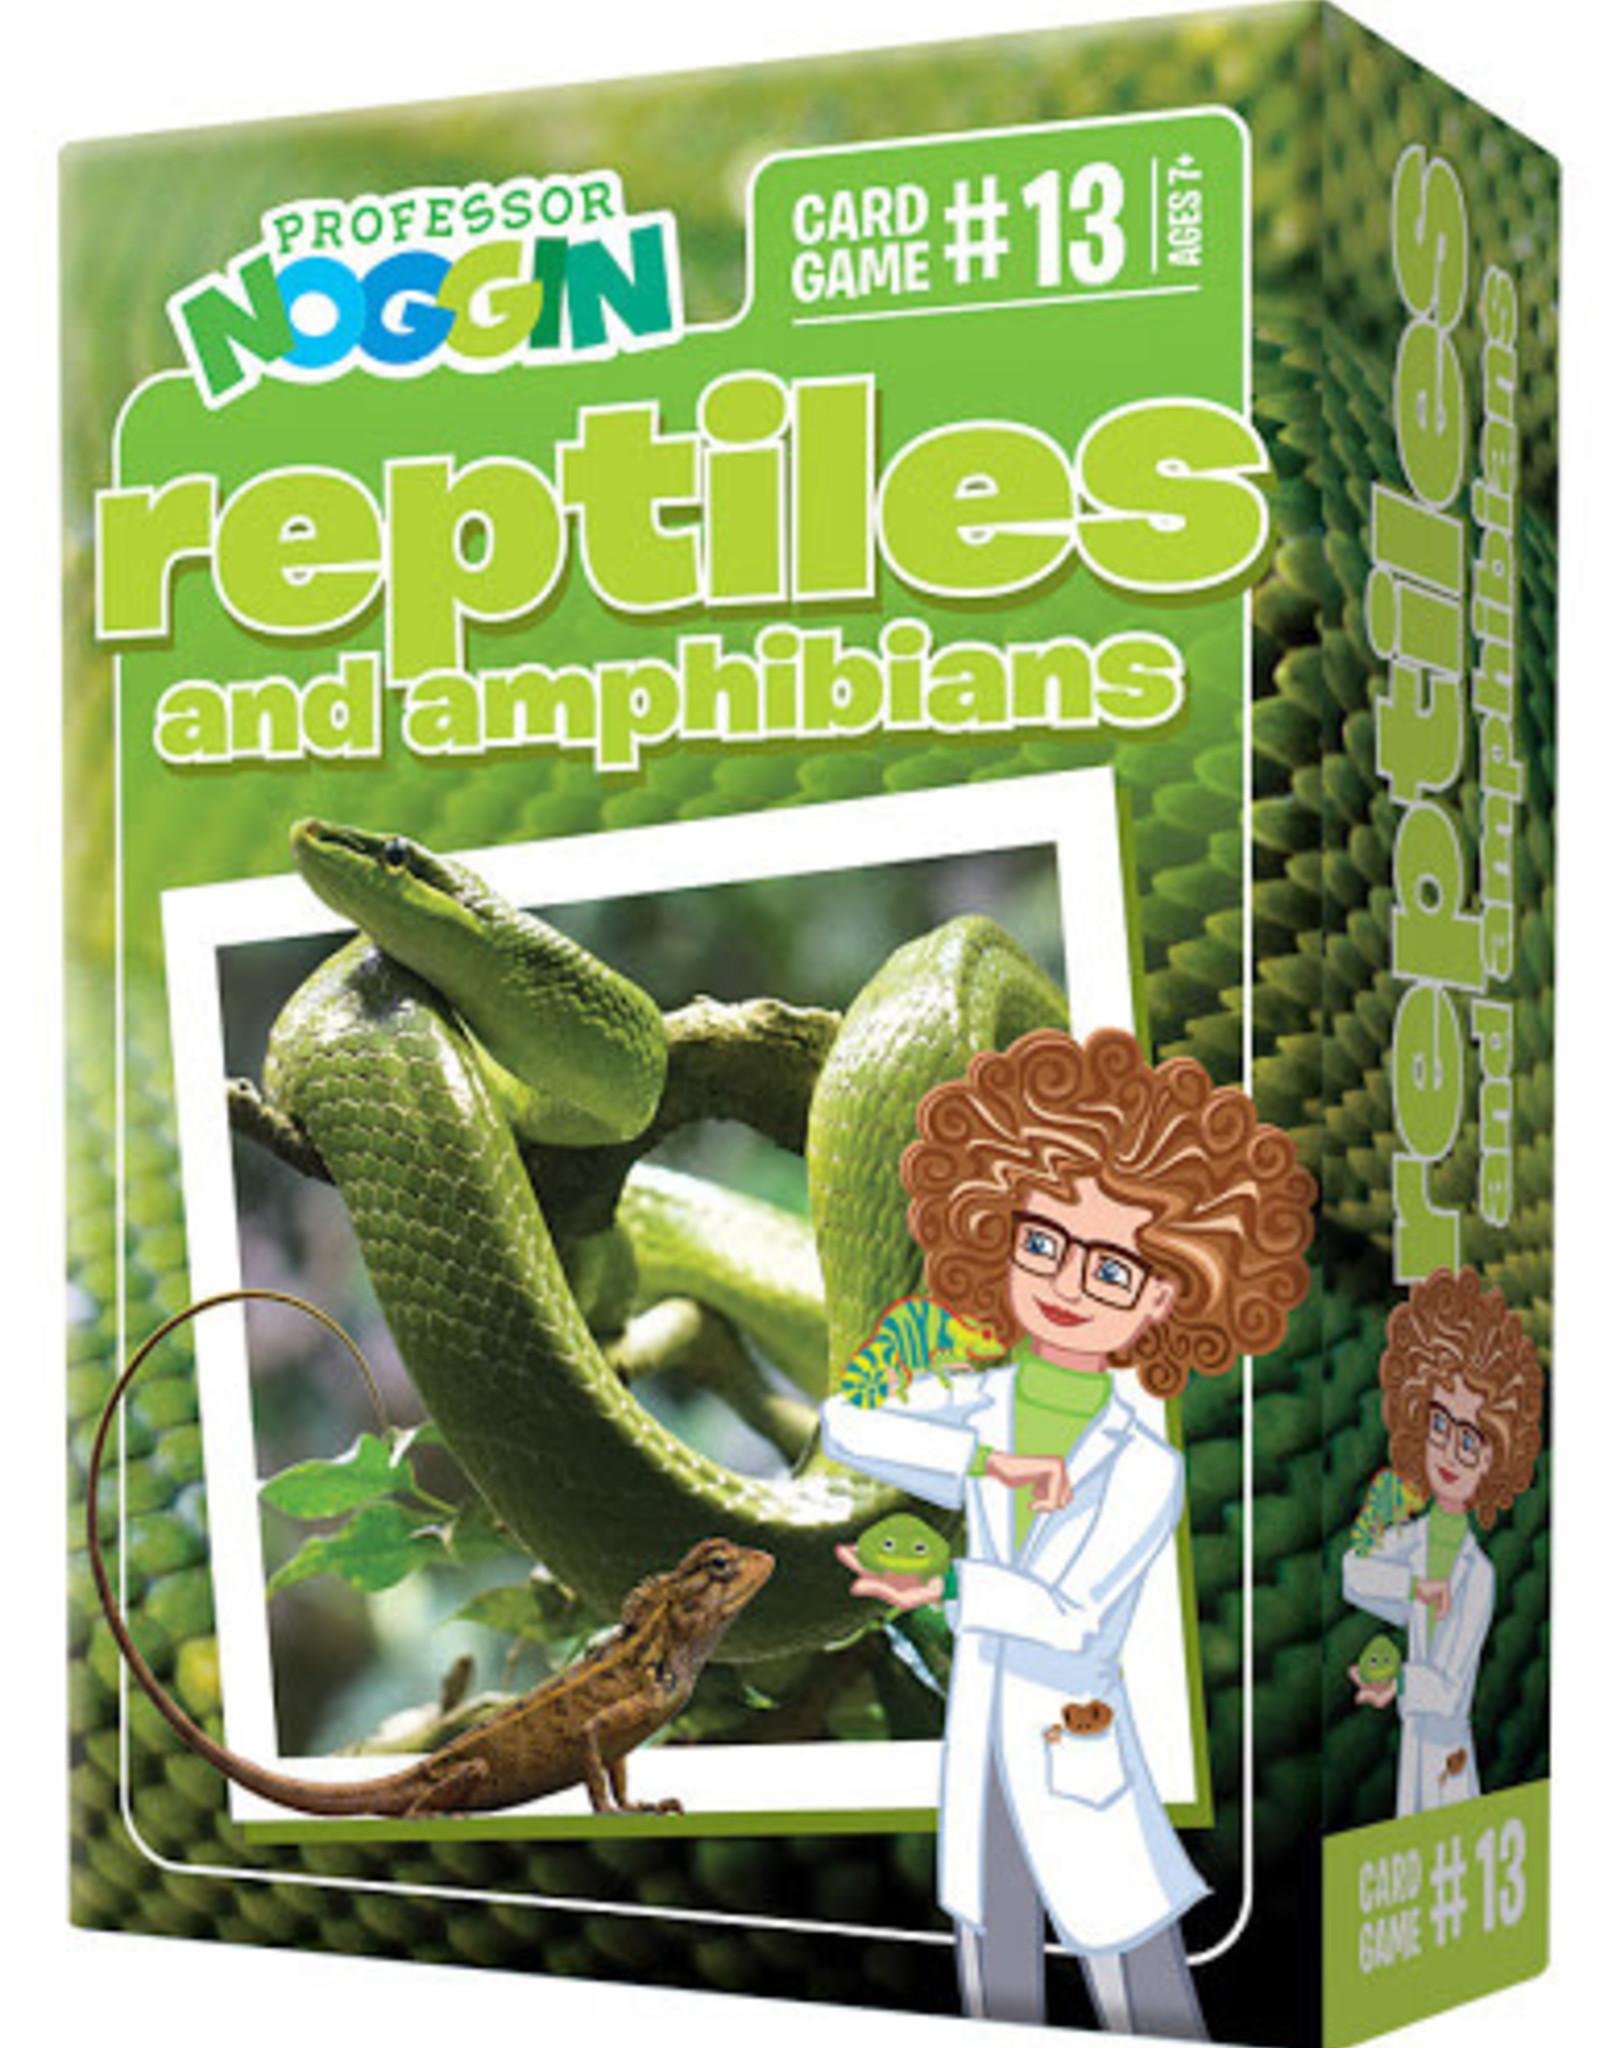 Professor Noggin Prof. Noggin Reptiles and Amphibians